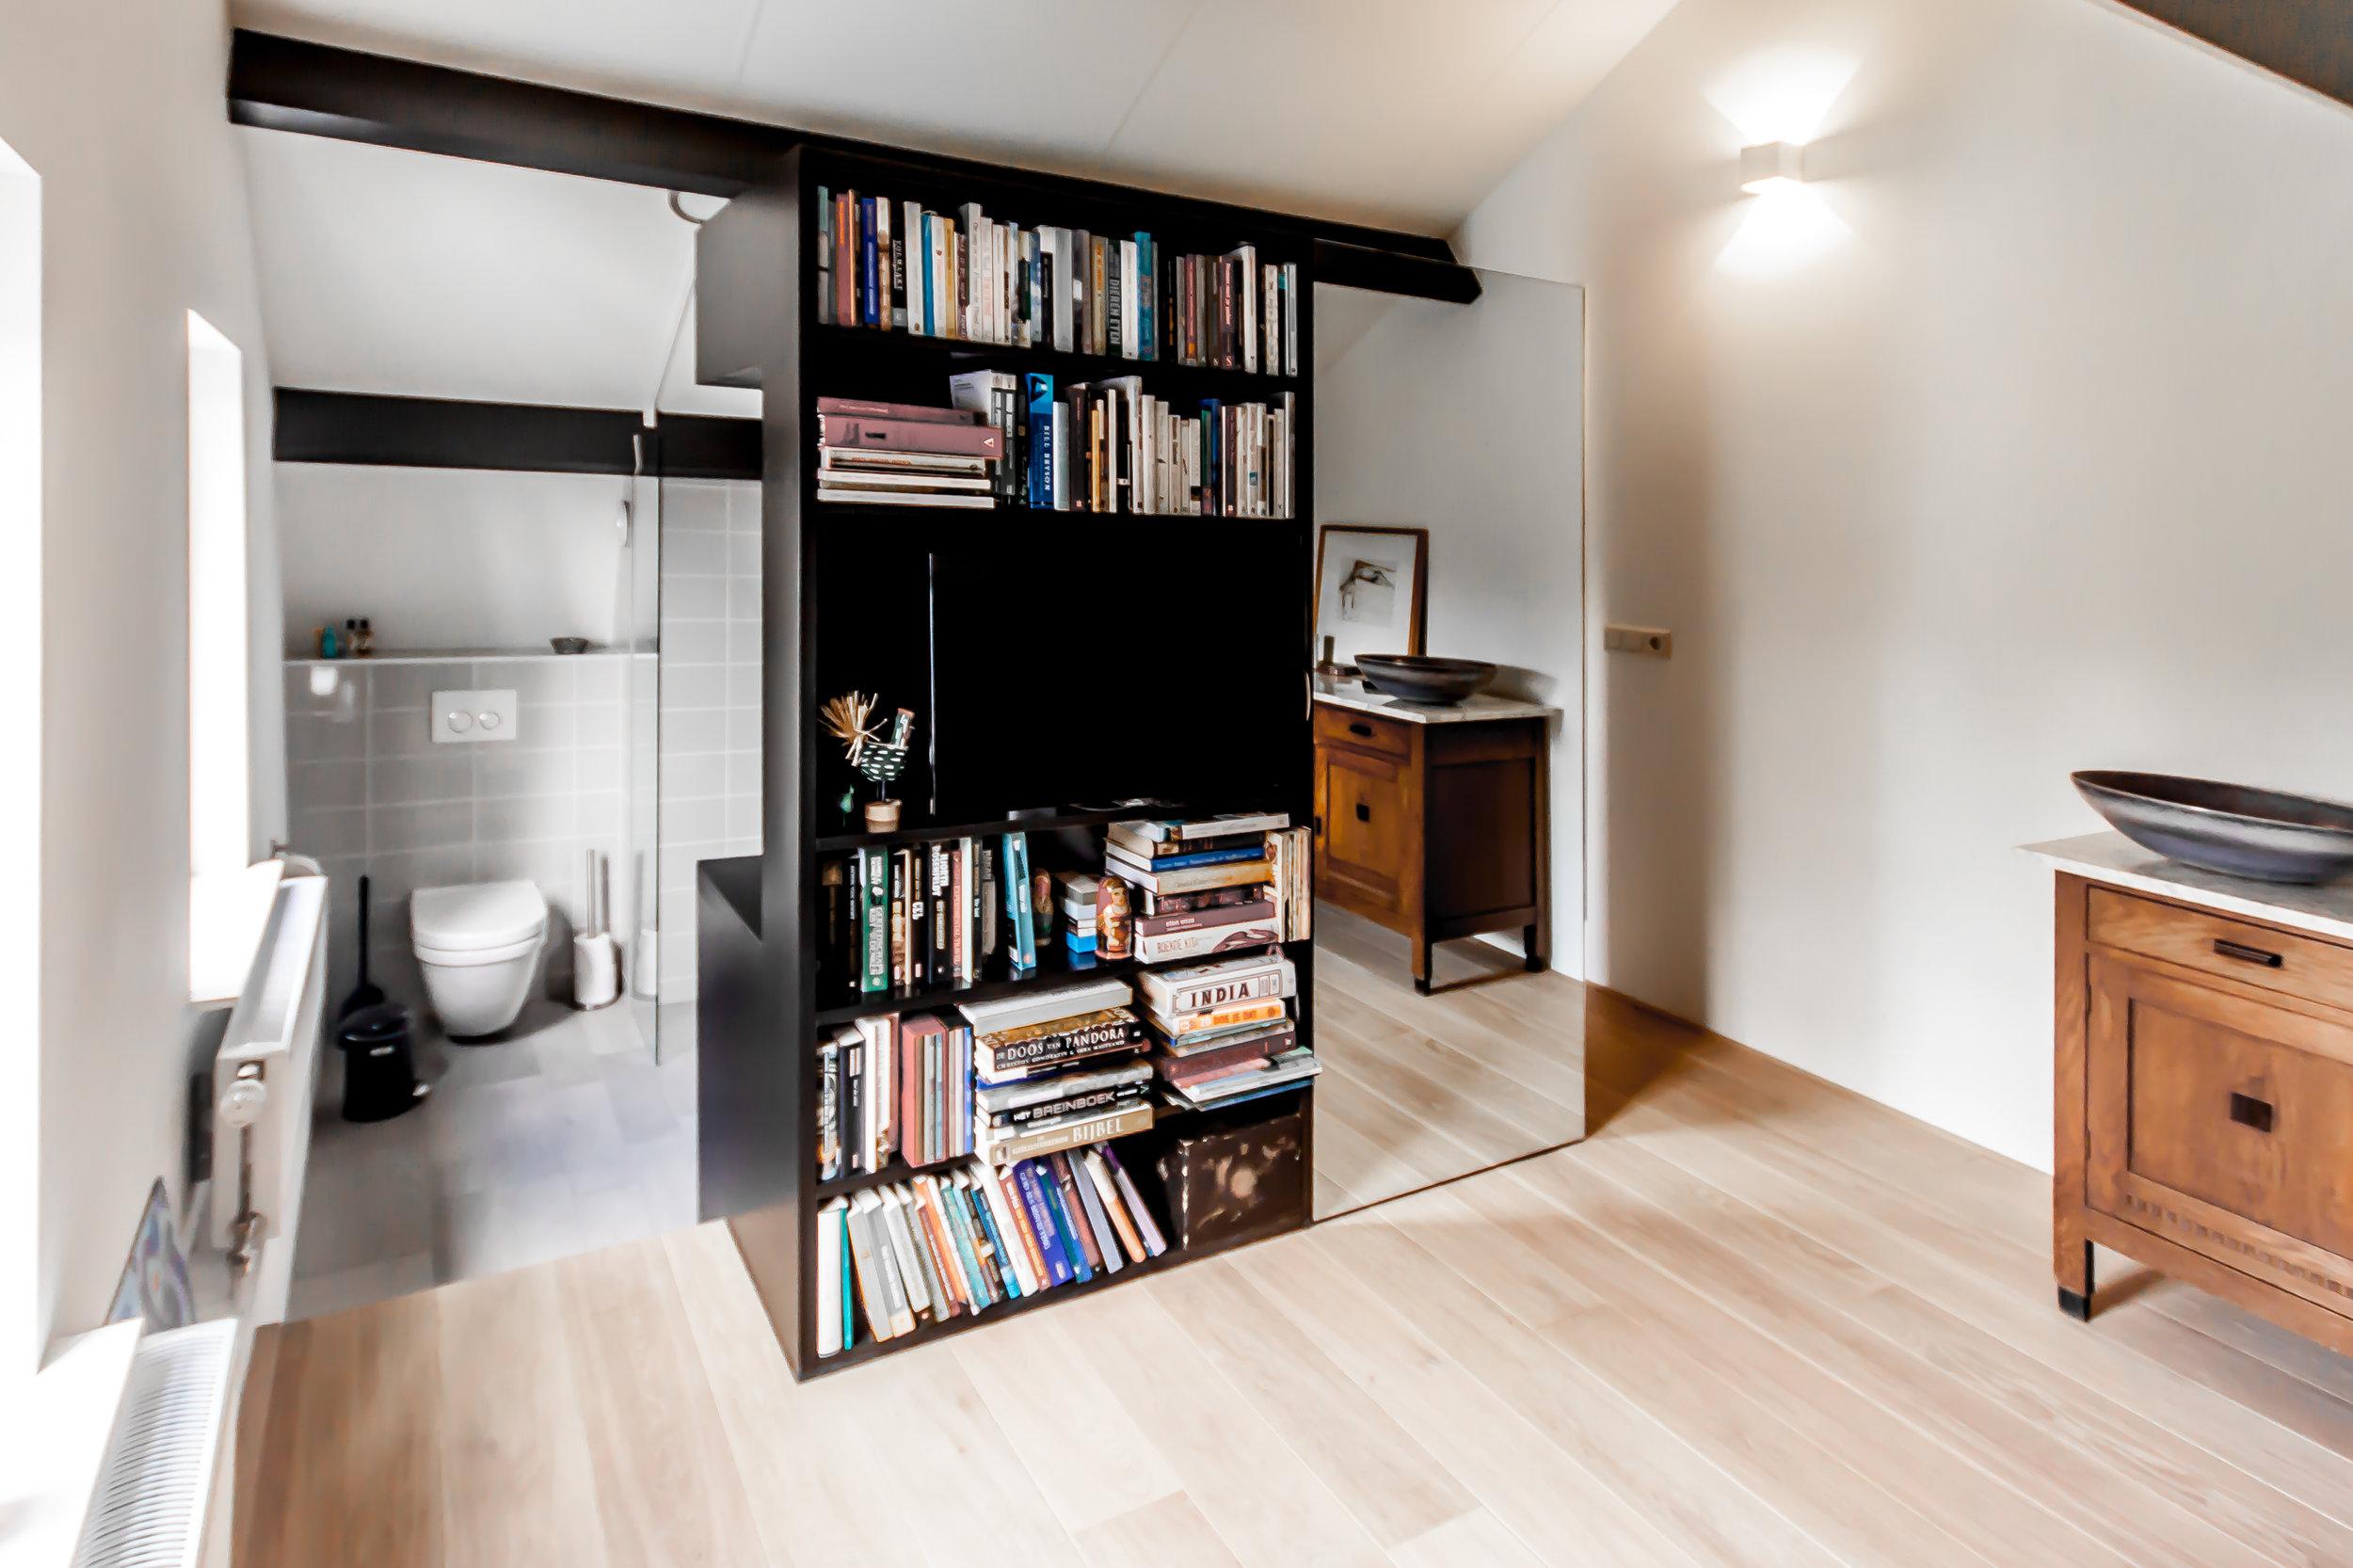 Gastenvertrek en badkamer met roomdivider meubel.